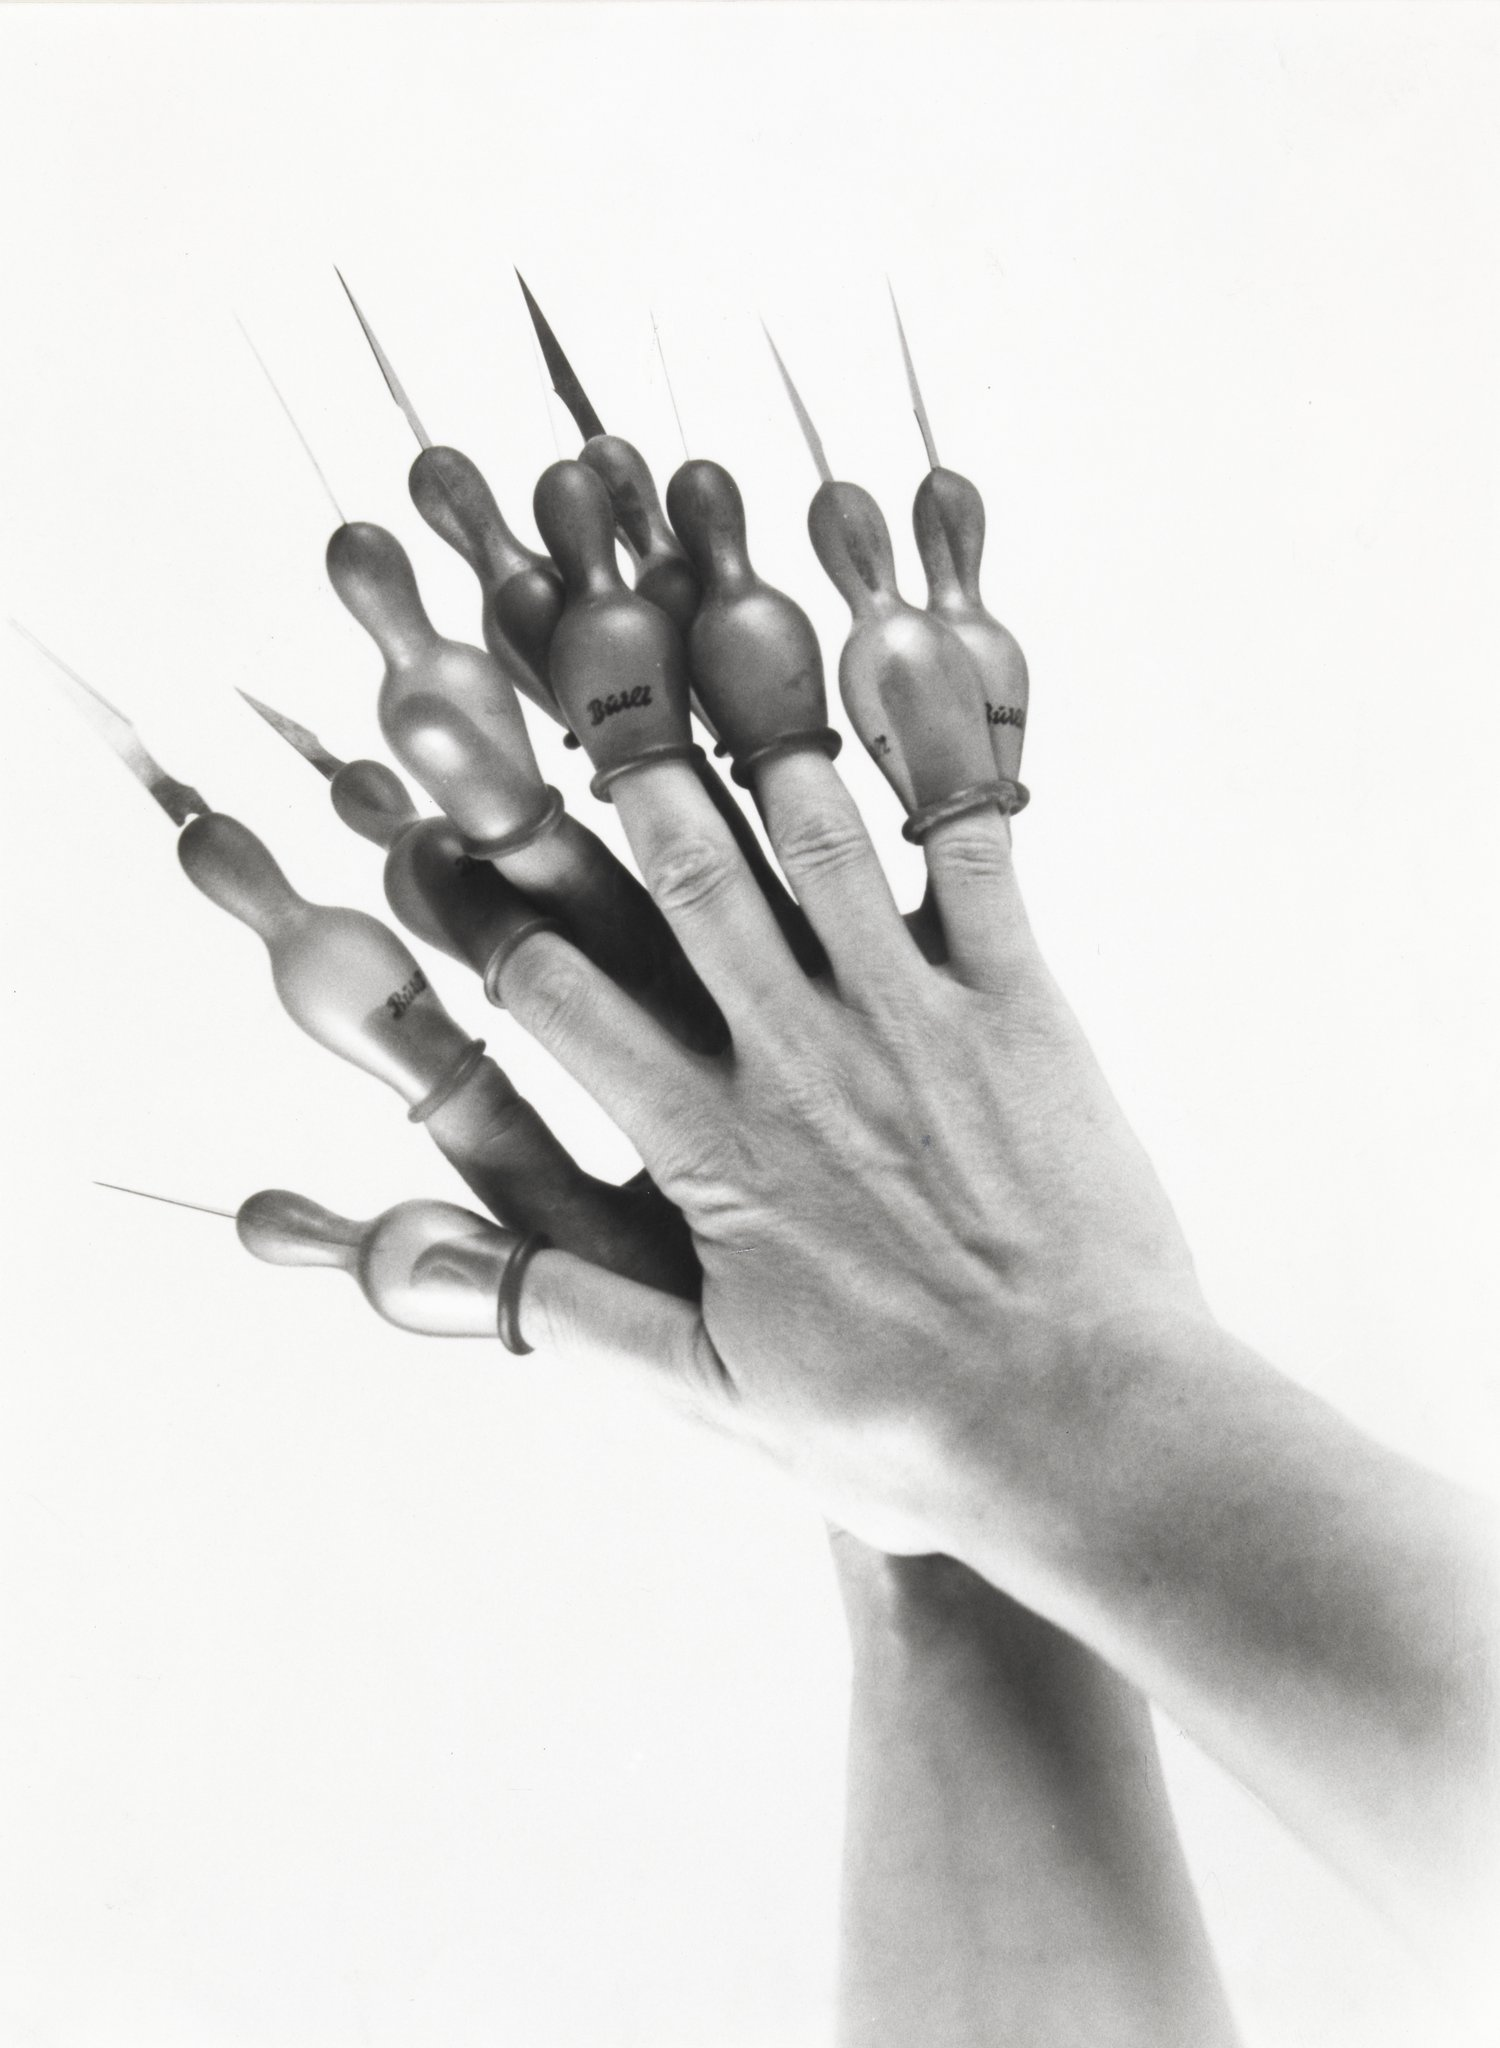 Renate Bertlmann, Messerschnullerhände - Ambivalenzen (Knife Dummy Hands - Ambivalence), 1981. Courtesy of the artist and Richard Saltoun Gallery